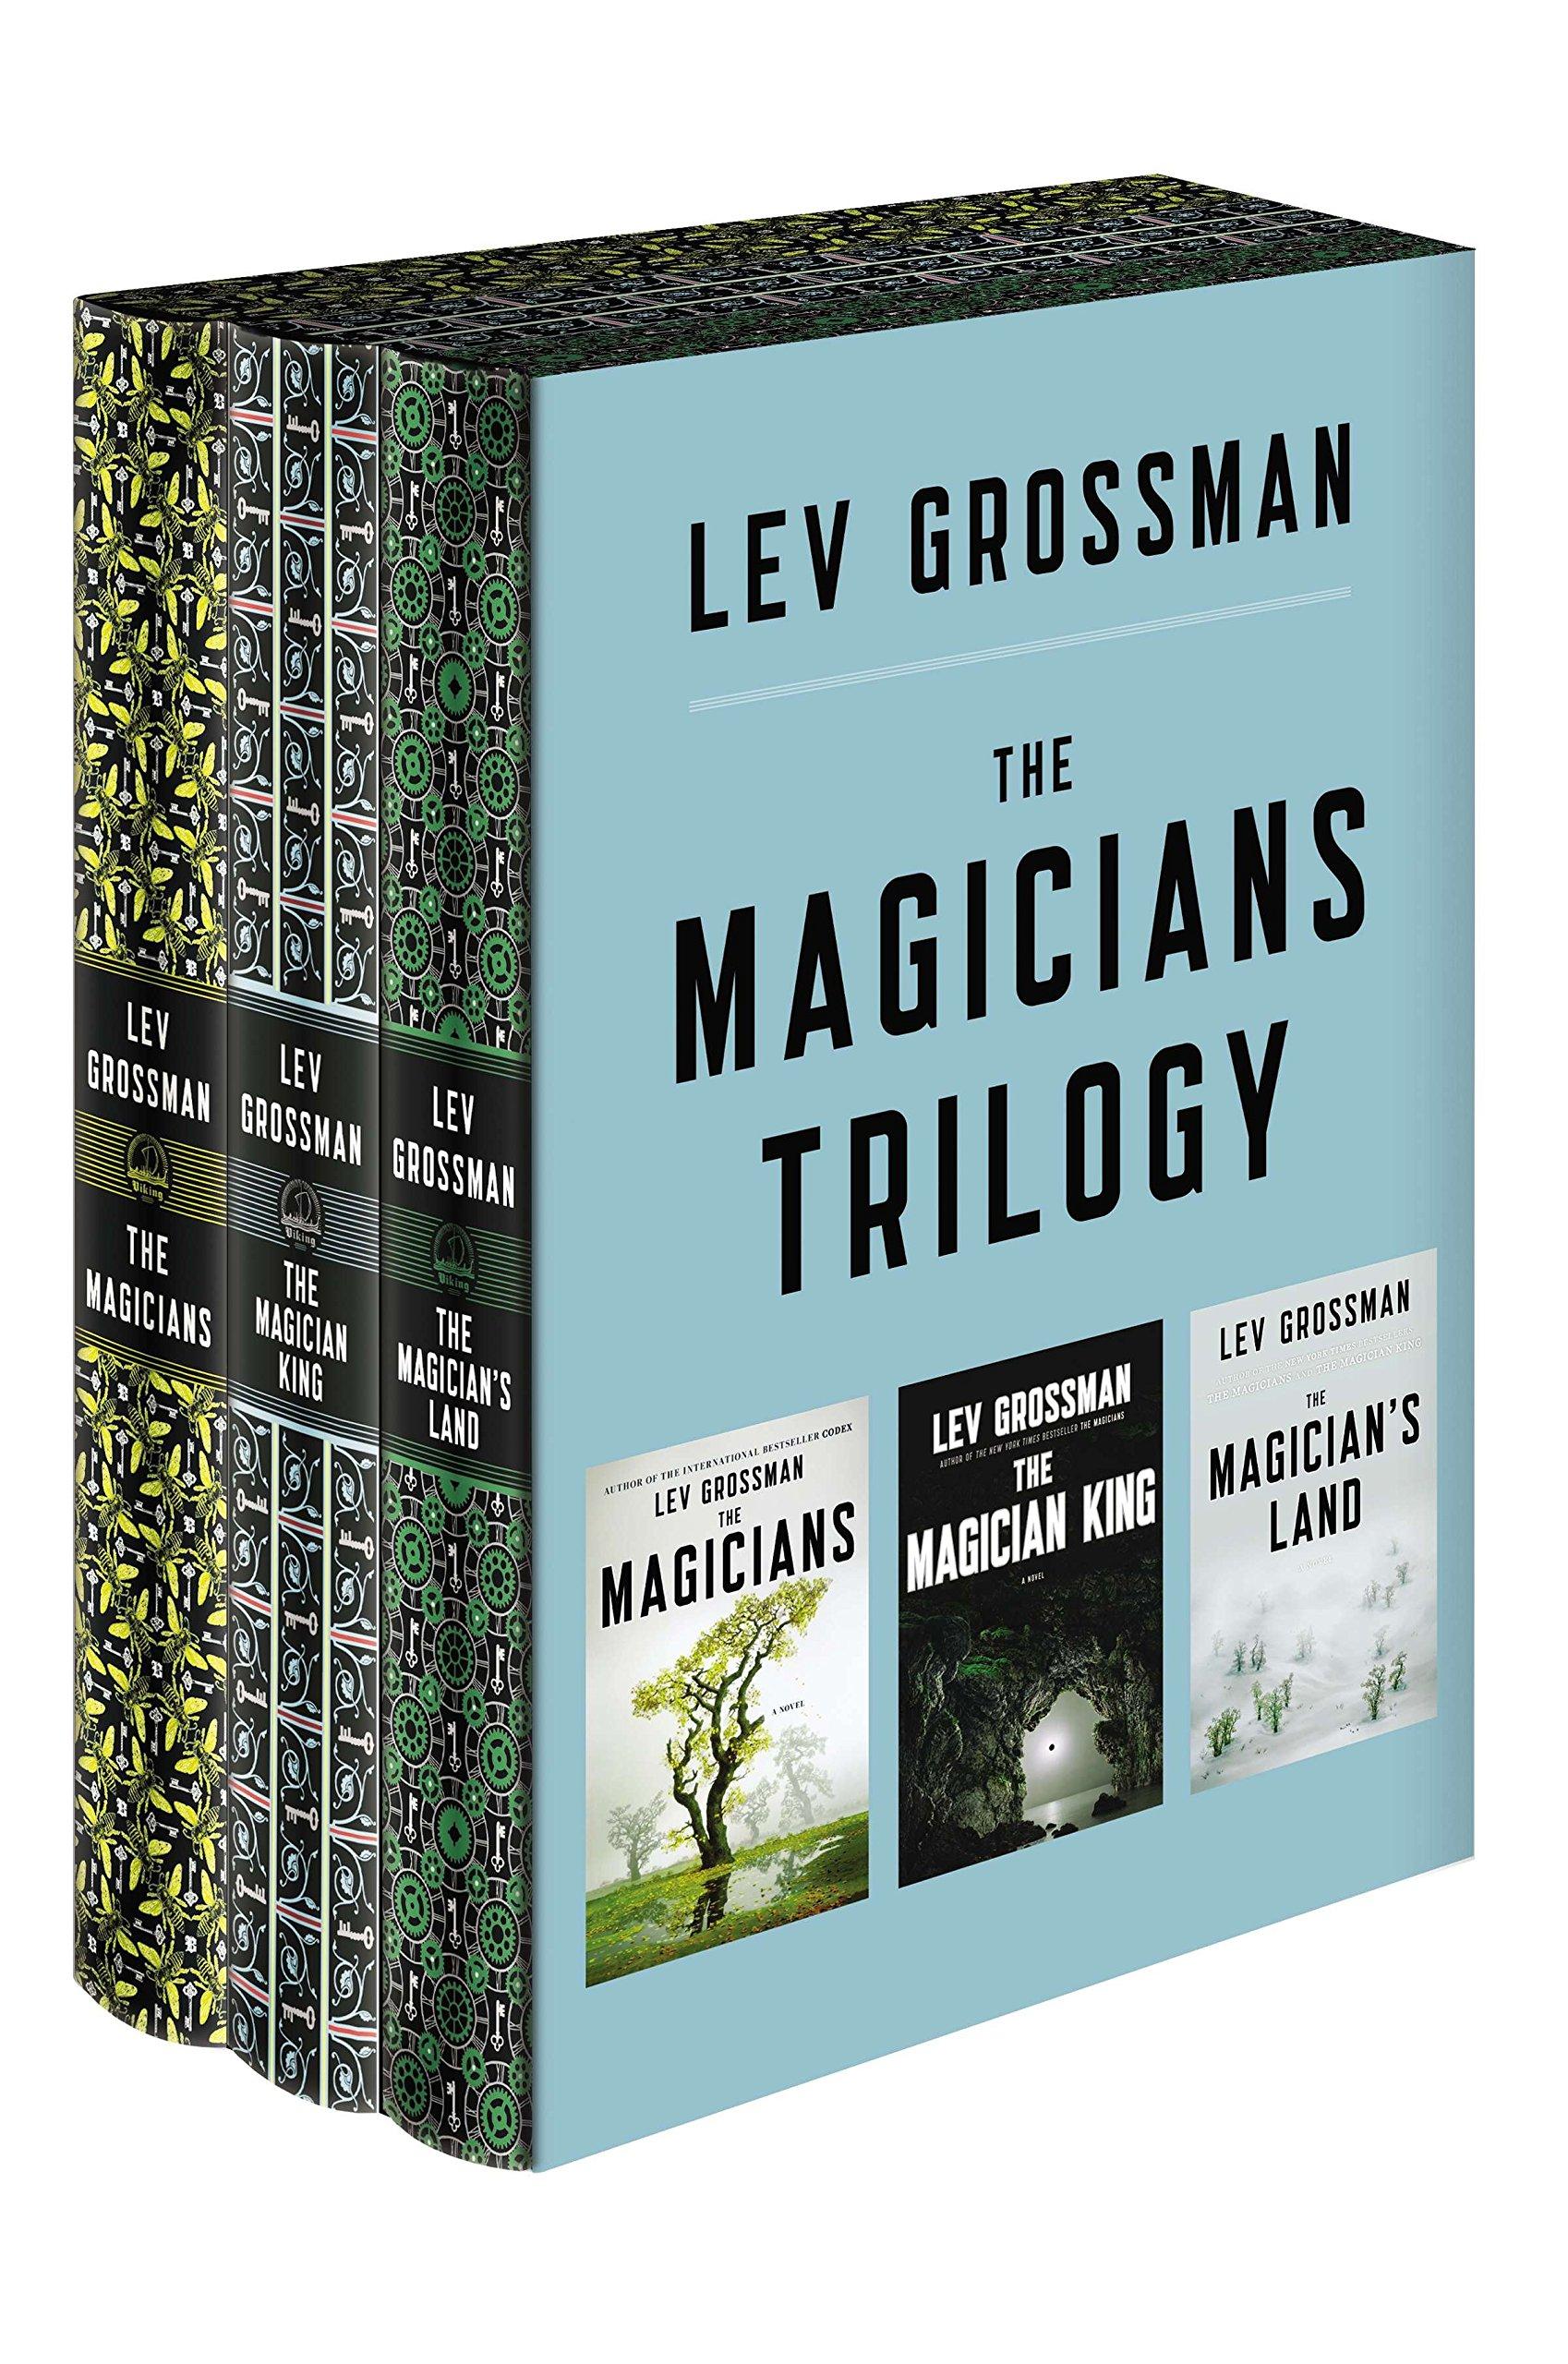 The Magicians Trilogy Boxed Set: The Magicians; The Magician King; The Magician's Land by Viking Pr